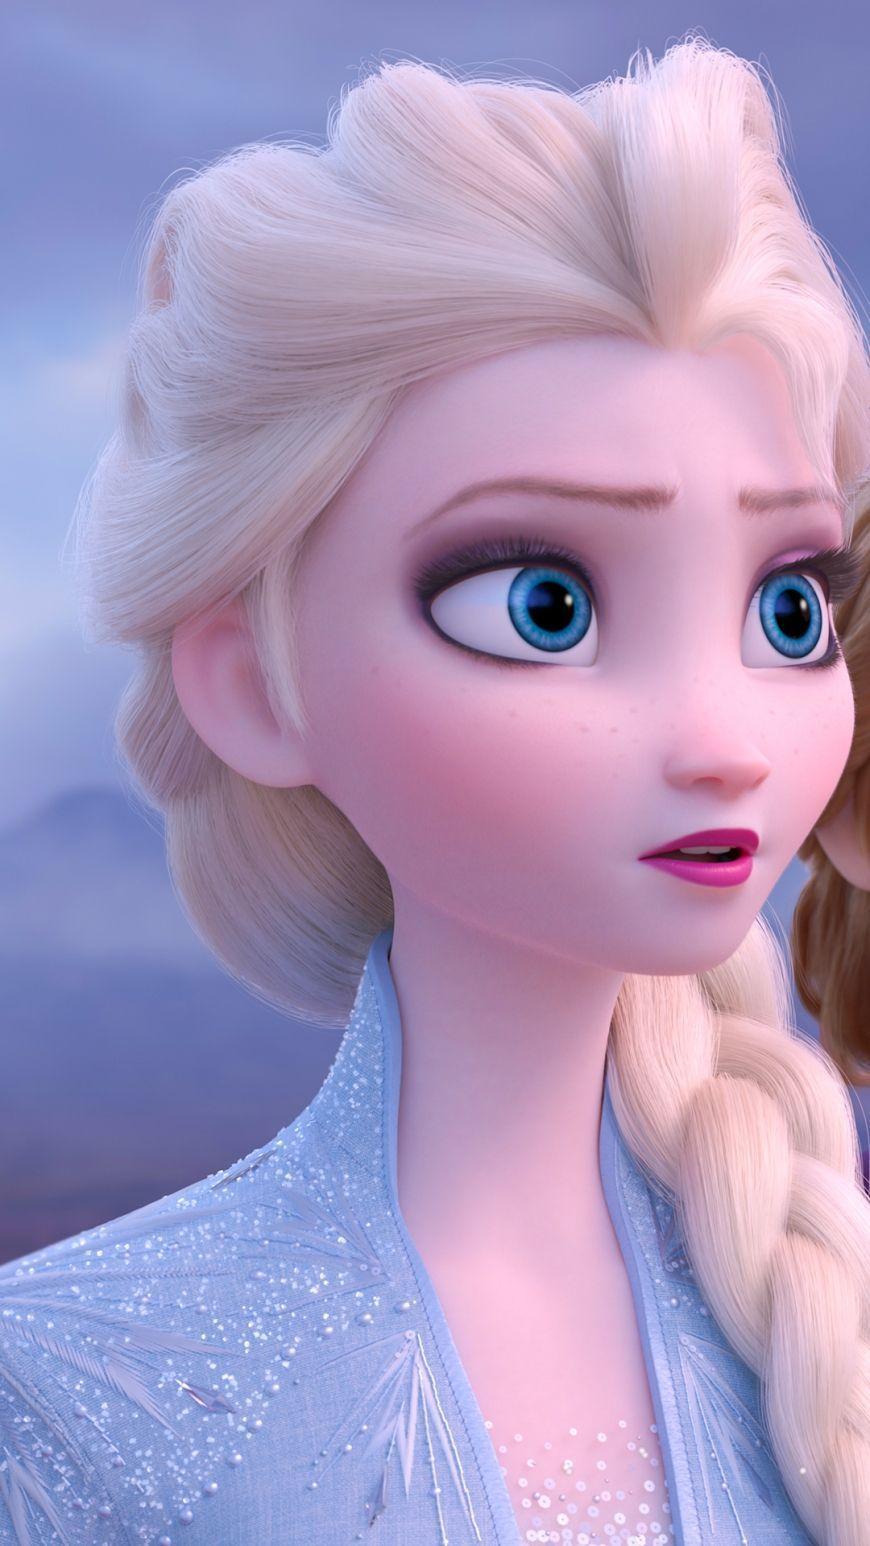 Disney Frozen 2 Fonds D Ecran De Telephone Mobile In 2020 Disney Princess Wallpaper Disney Princess Frozen Wallpaper Iphone Disney Princess